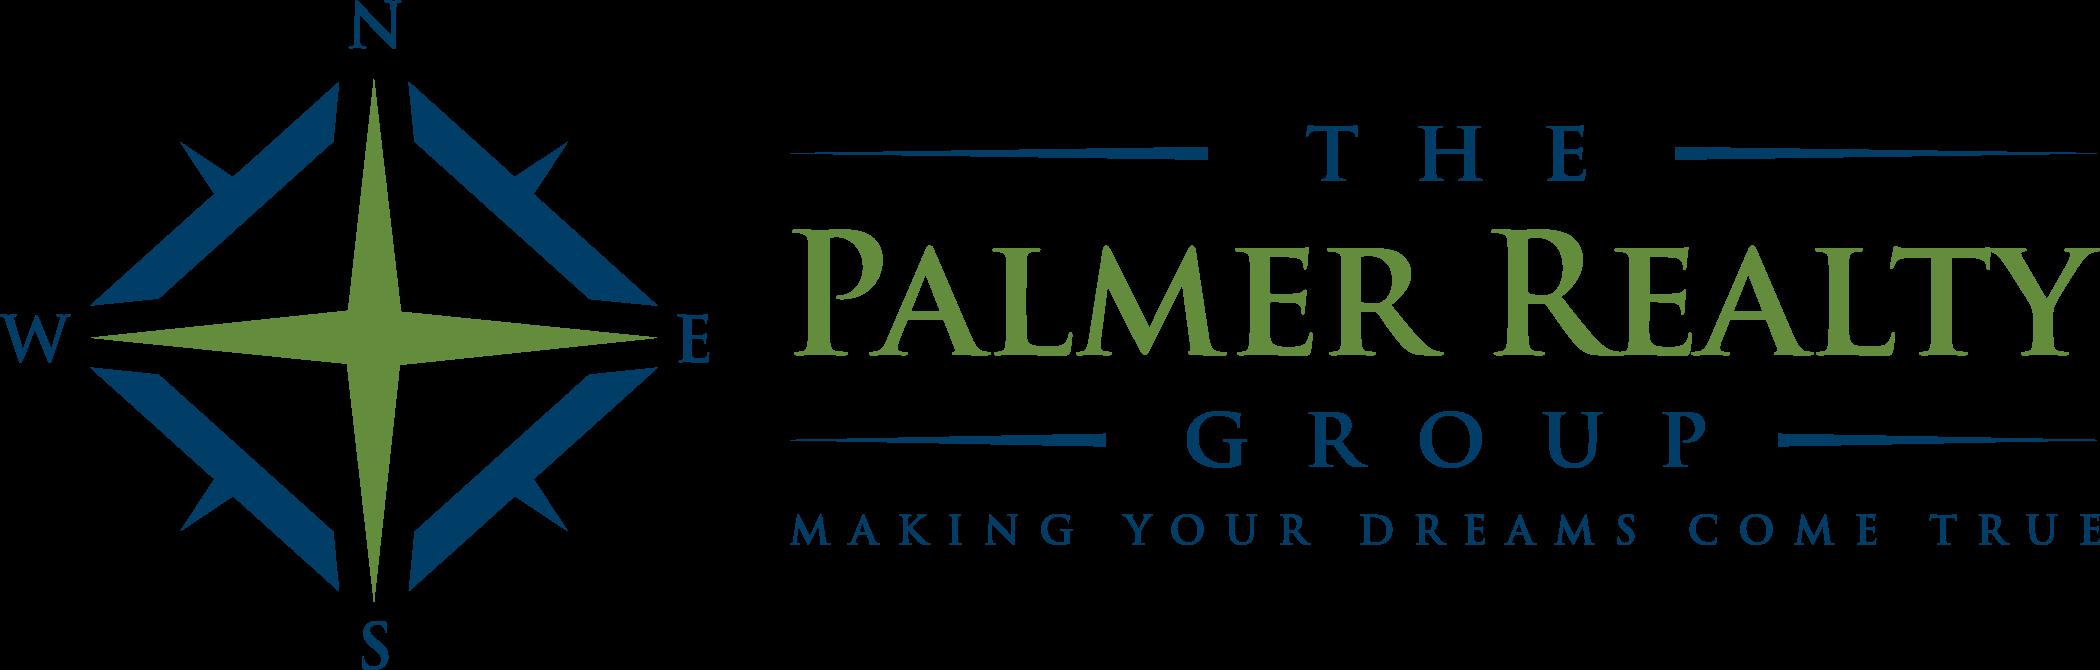 Palmer realty logo